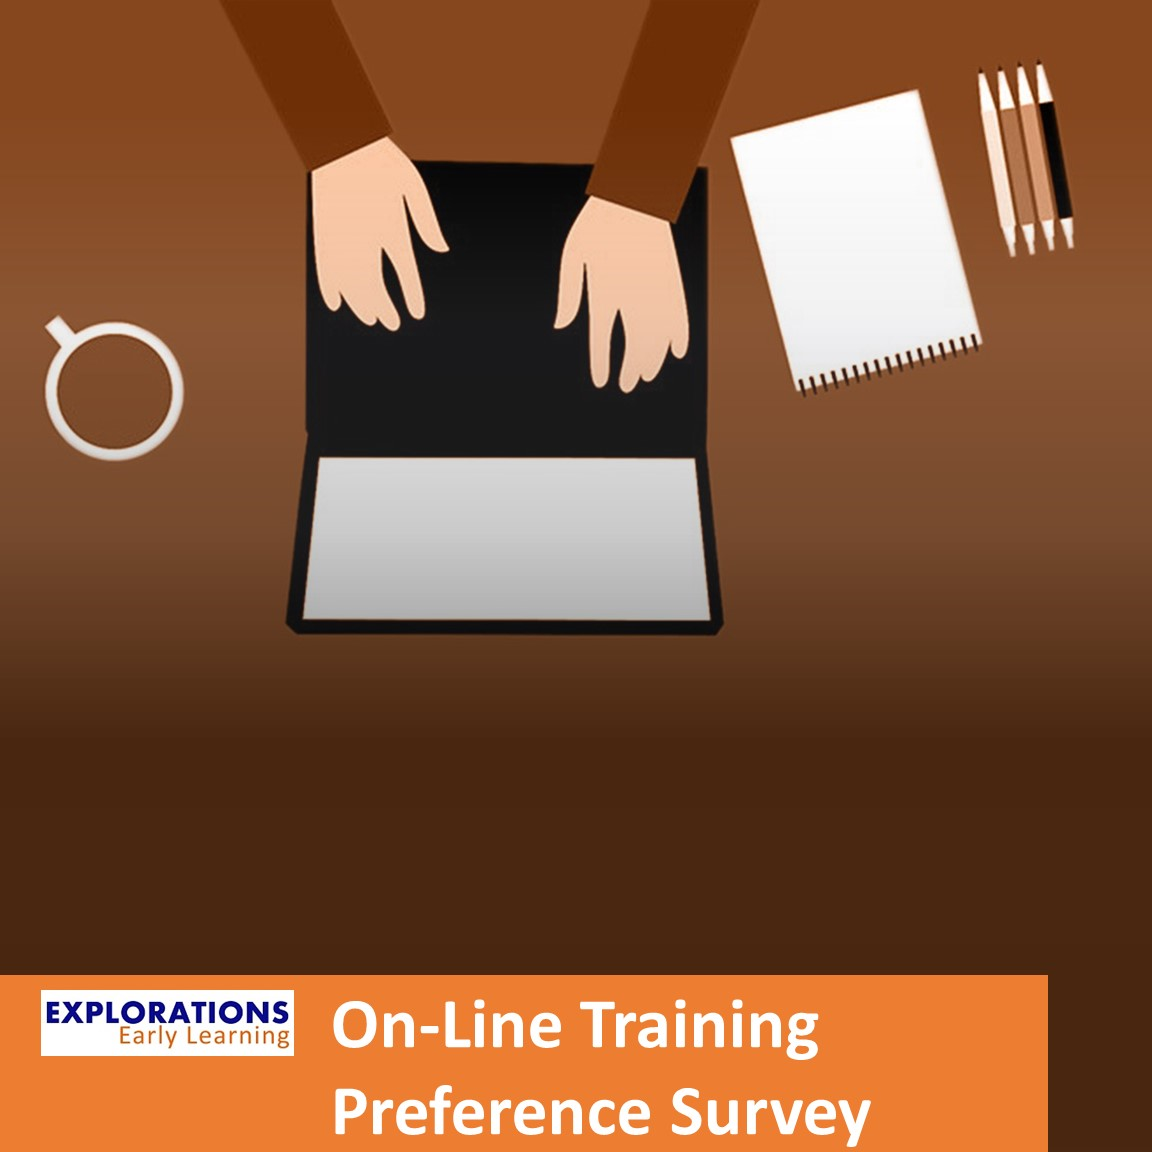 On-Line Training Preference Survey